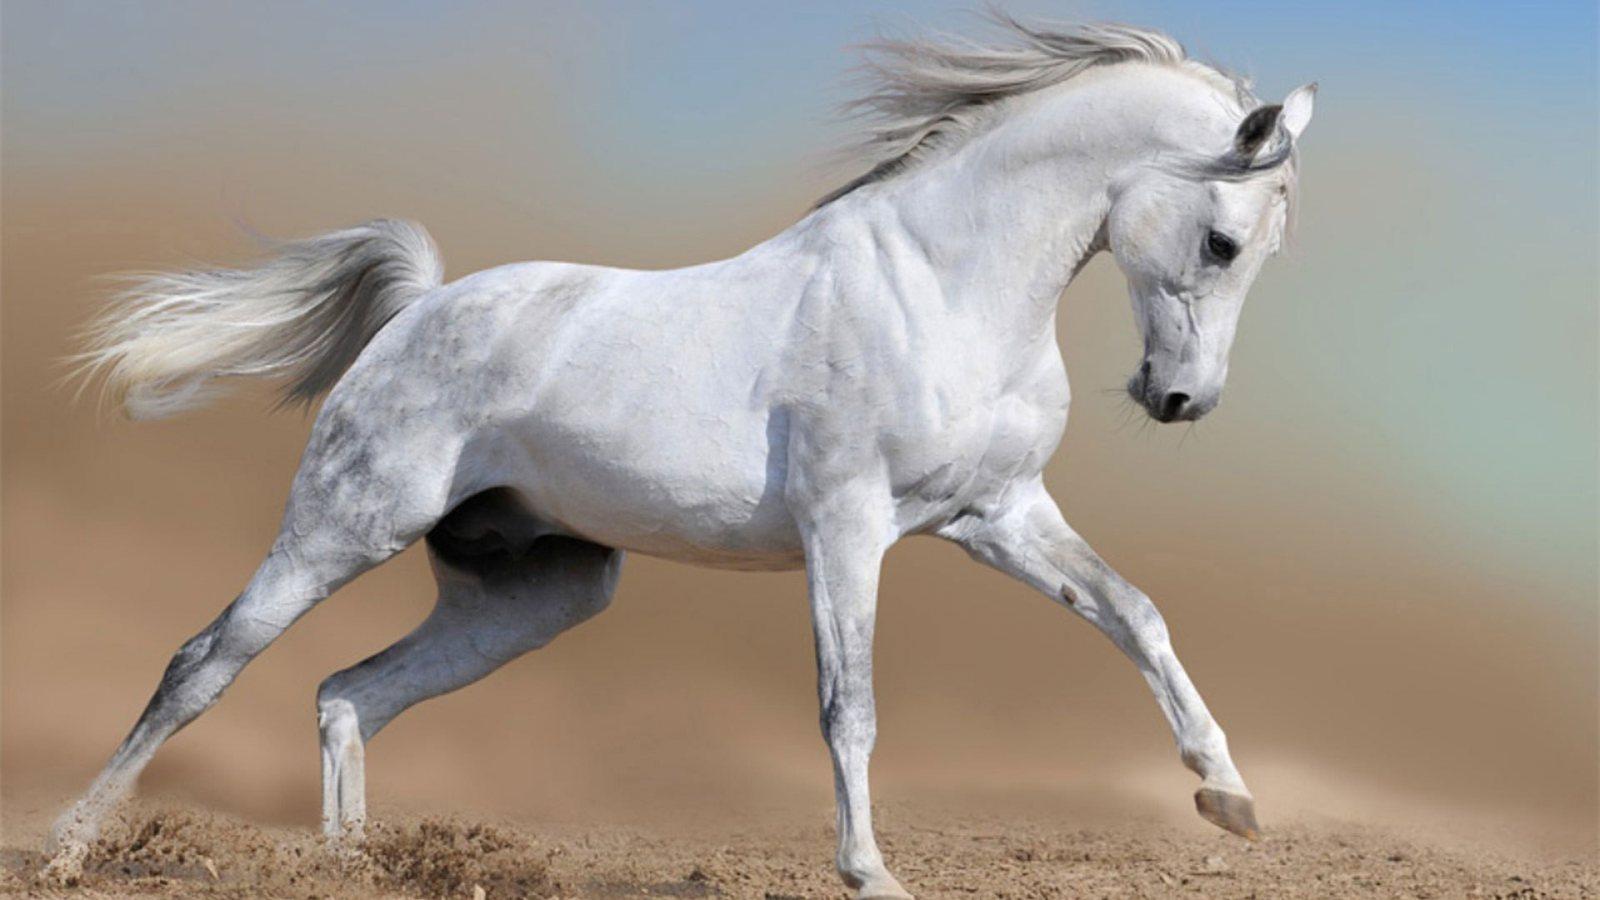 horse hd desktop wallpapers horse hd desktop wallpapers horse hd 1600x900